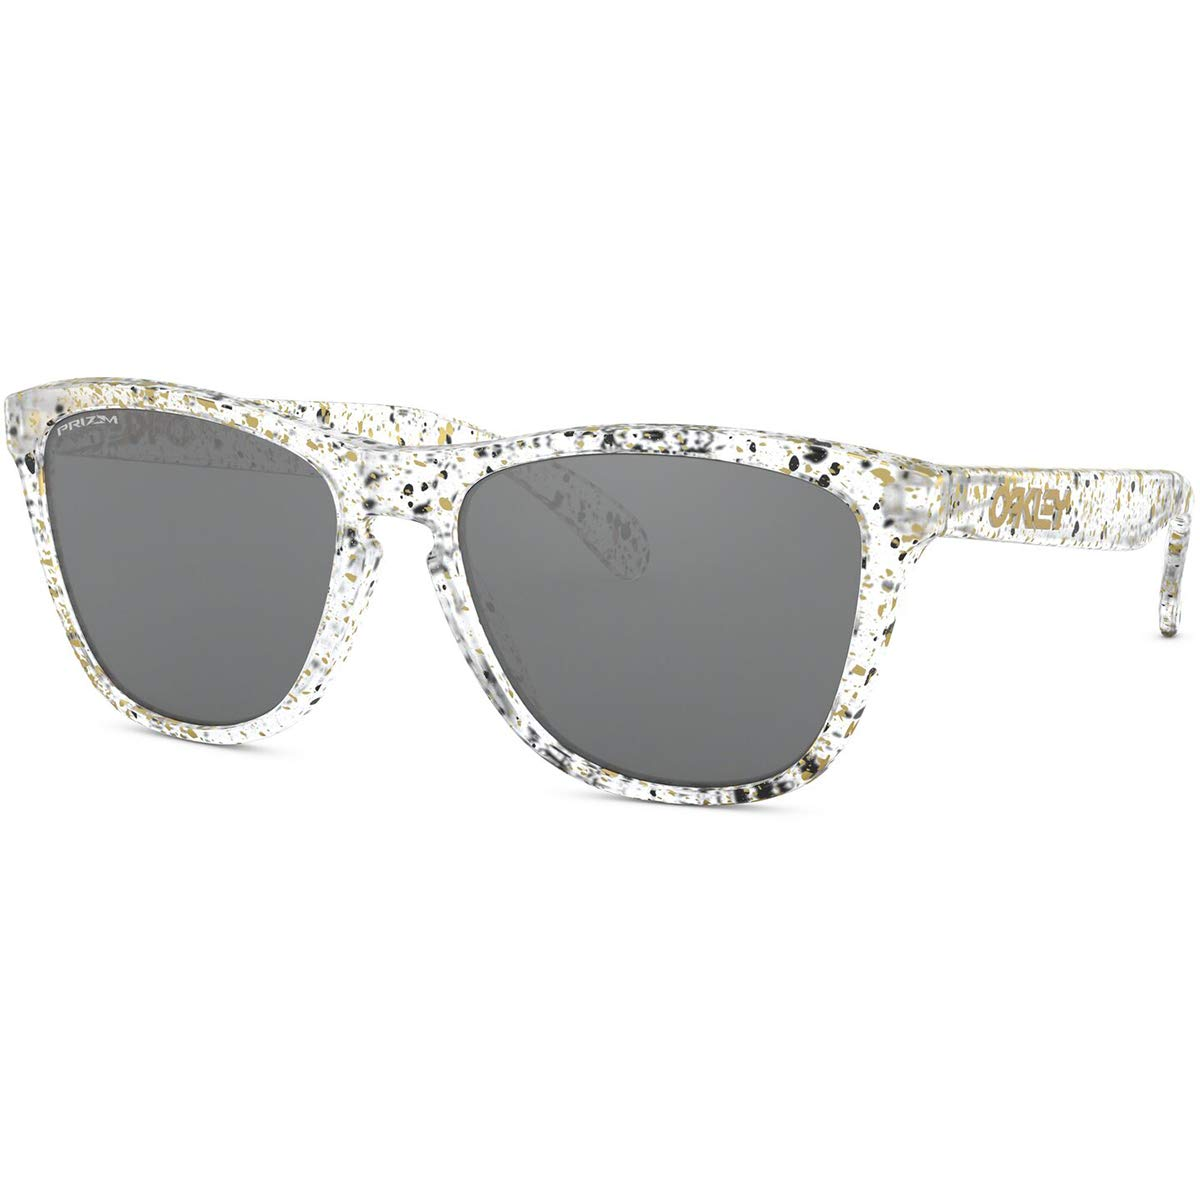 Oakley Men's Frogskins Sunglasses,OS,Splatter Clear/Prizm Black